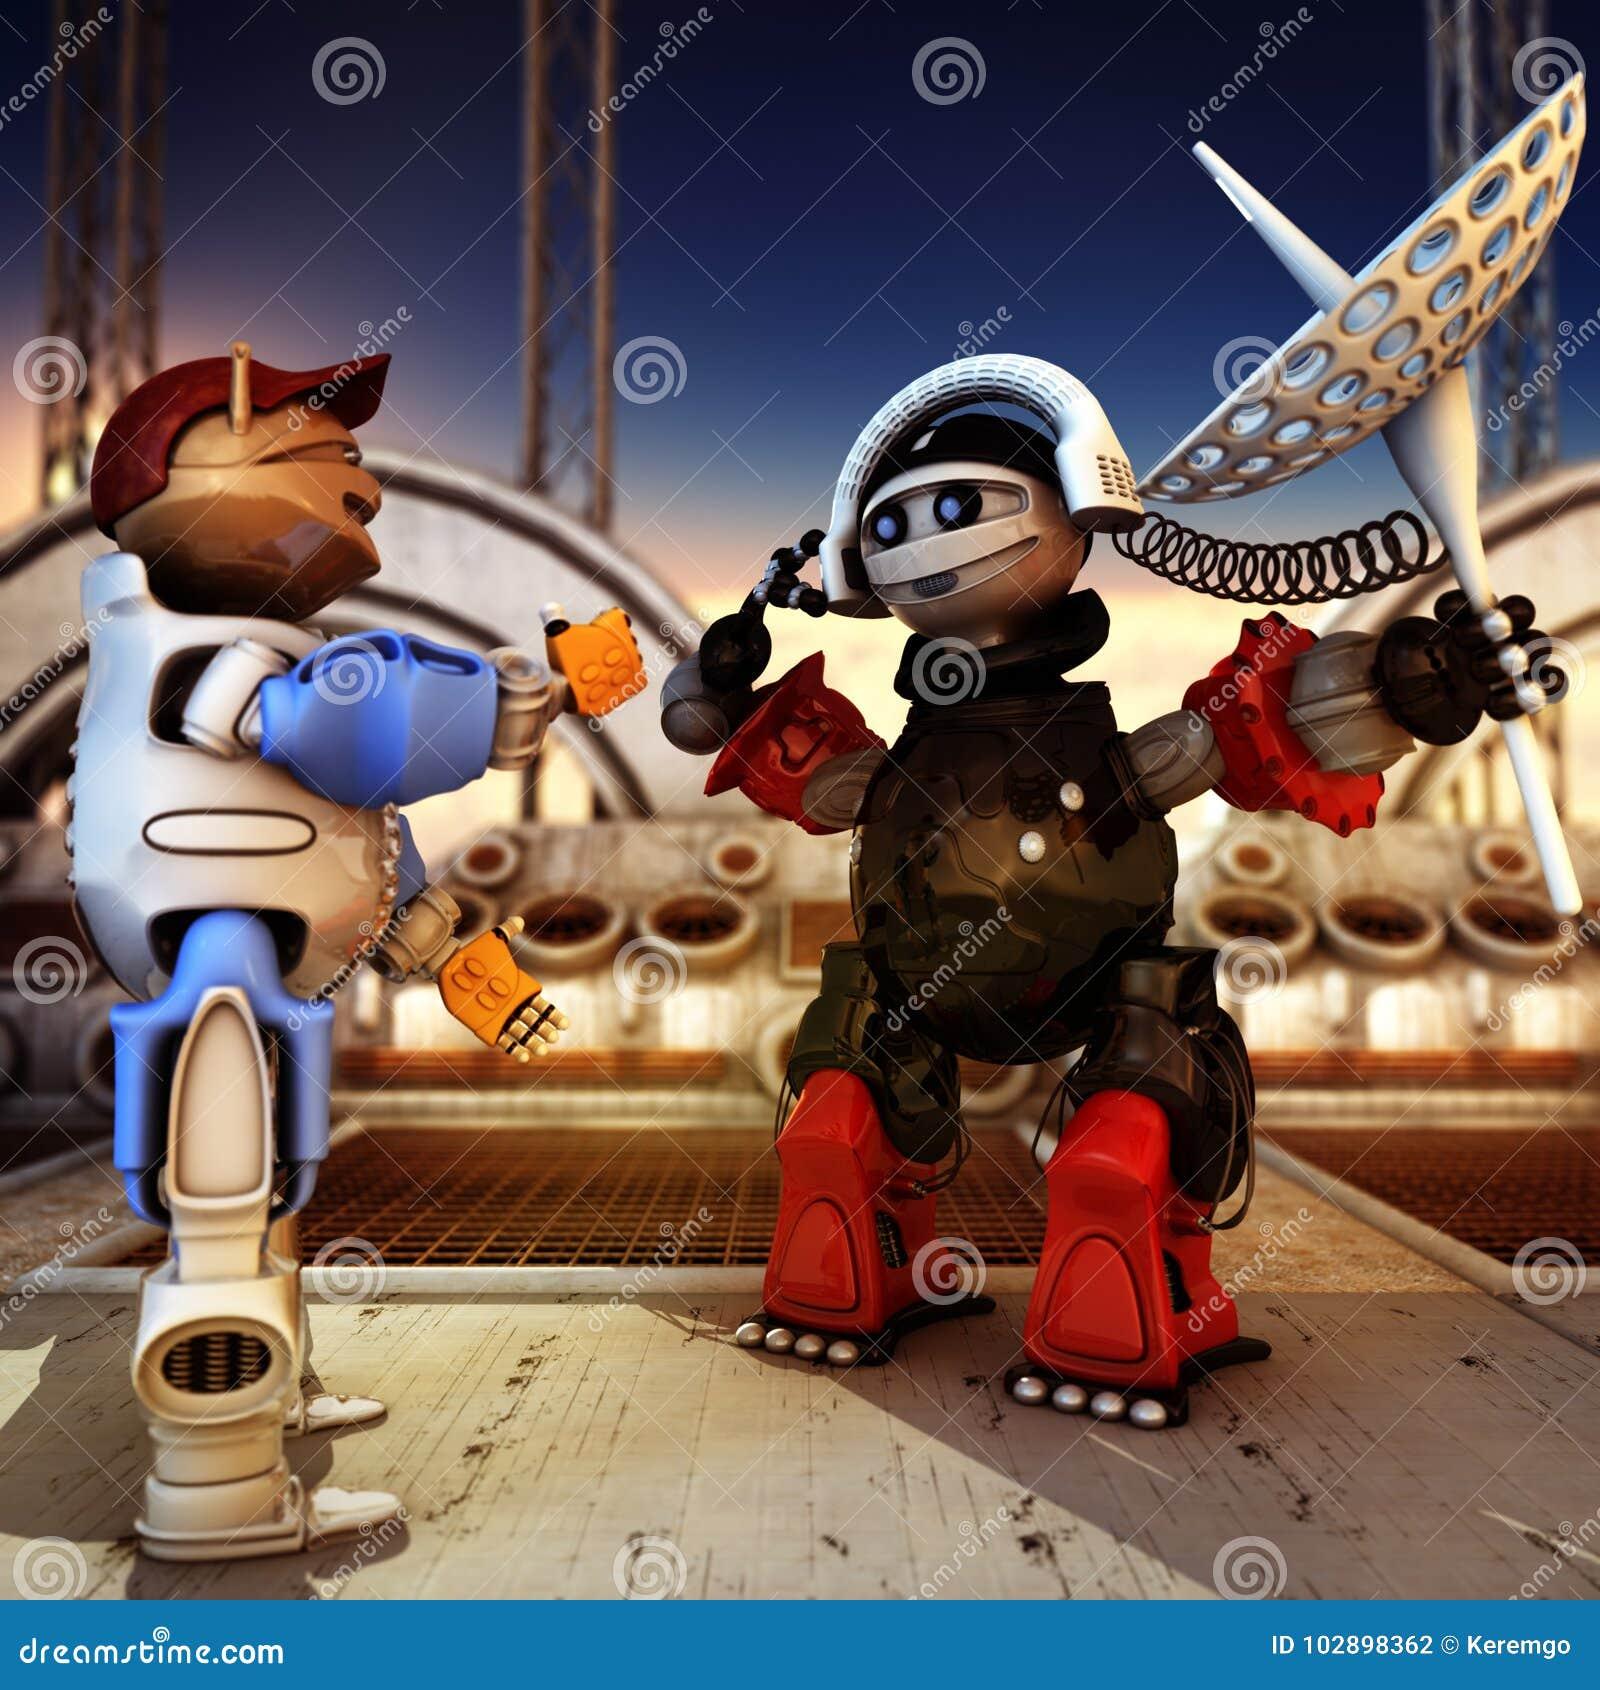 Funny Robots Having Conversation